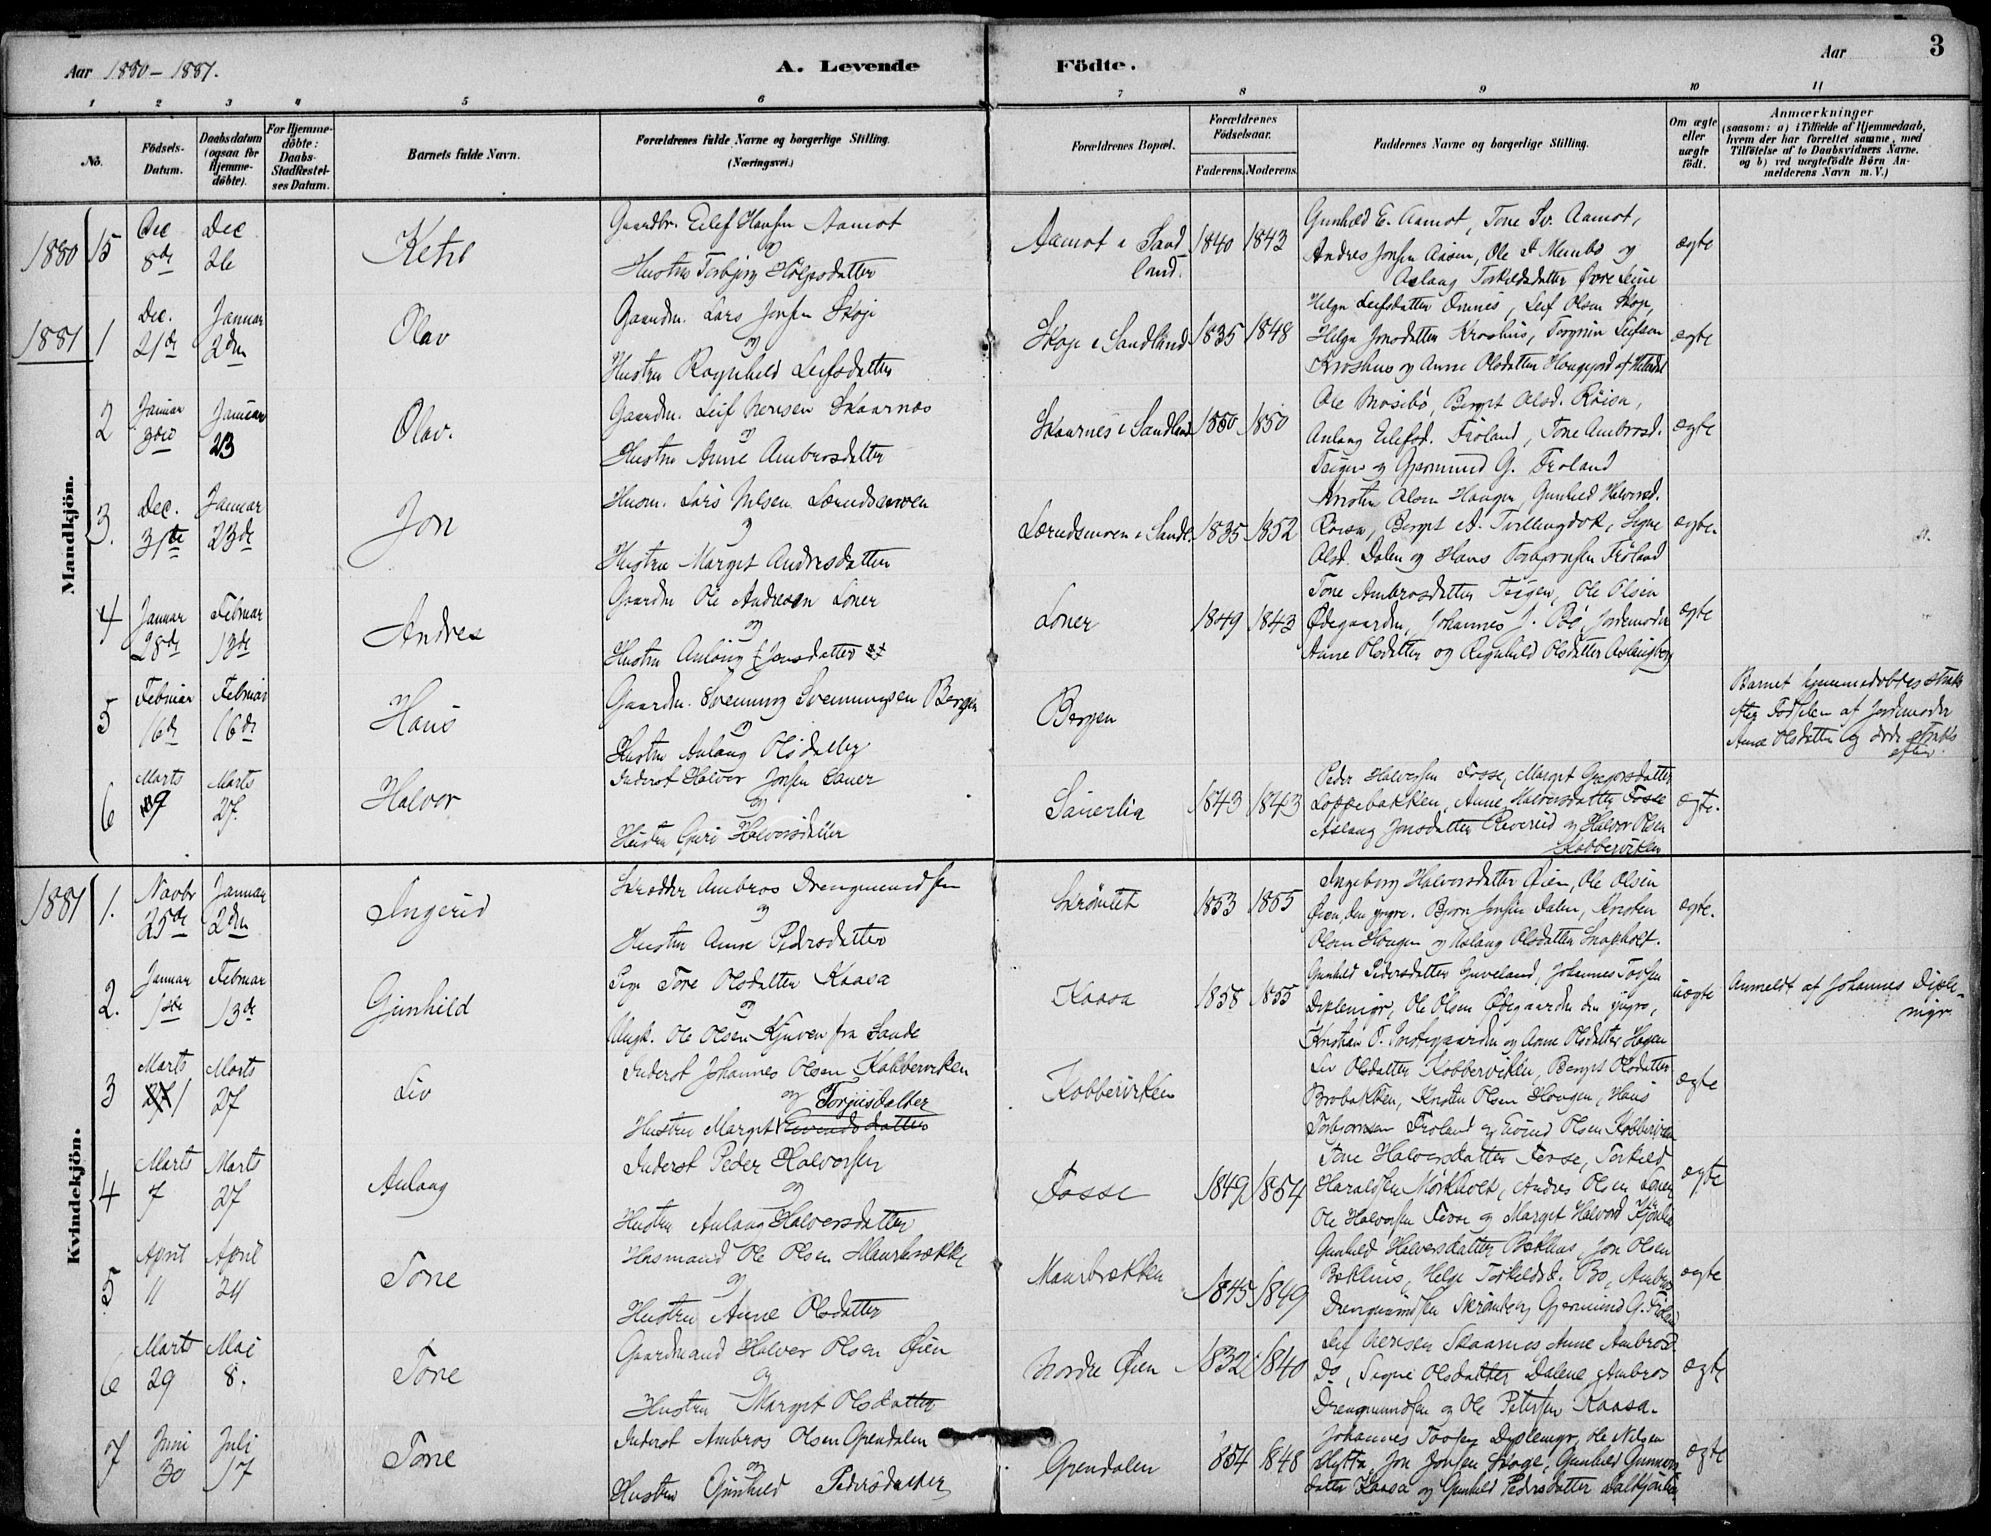 SAKO, Hjartdal kirkebøker, F/Fb/L0002: Ministerialbok nr. II 2, 1880-1932, s. 3